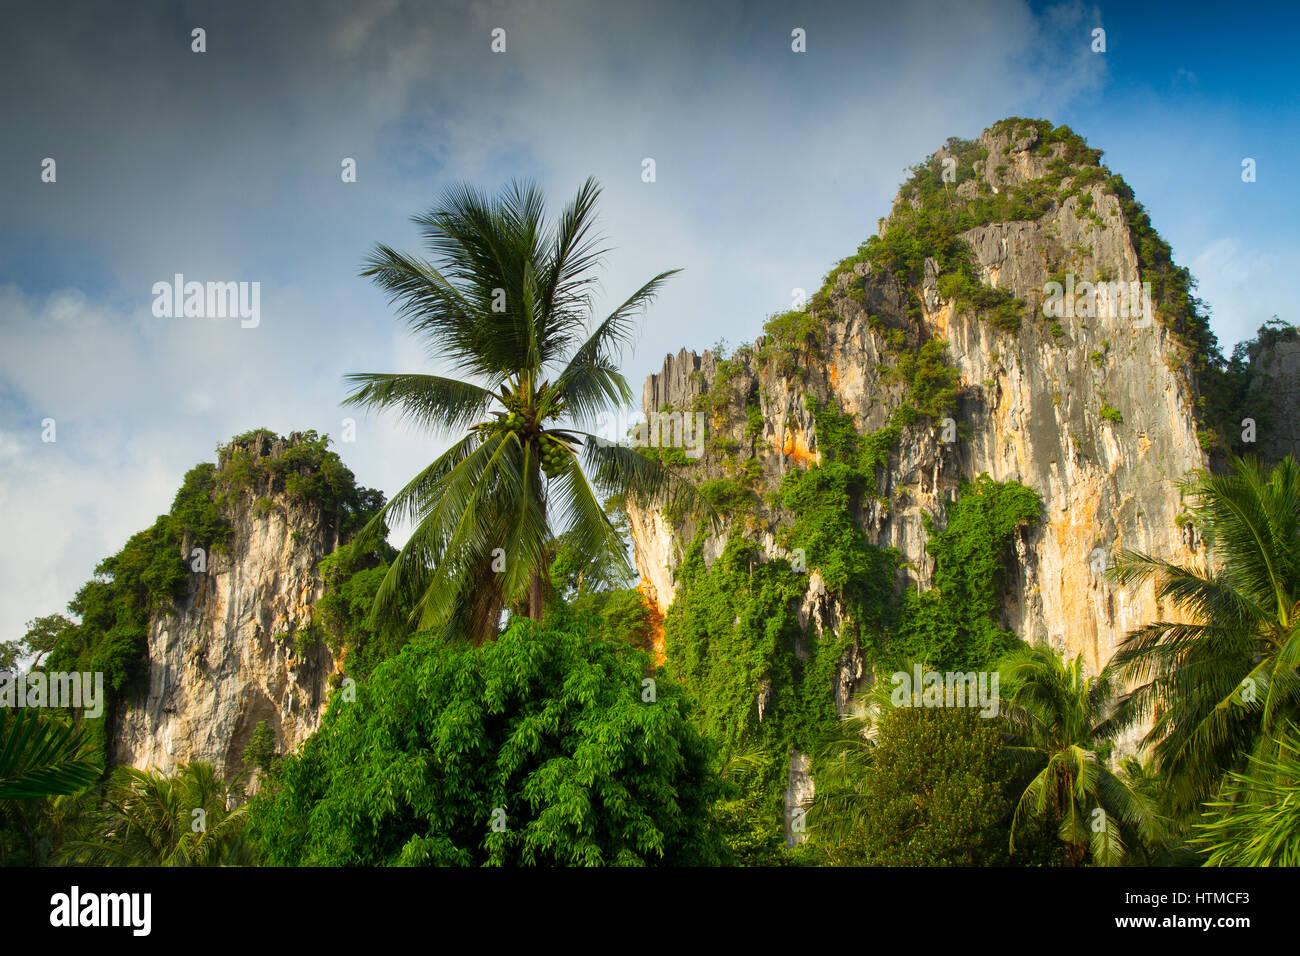 Railay. Krabi province, Thailand. - Stock Image